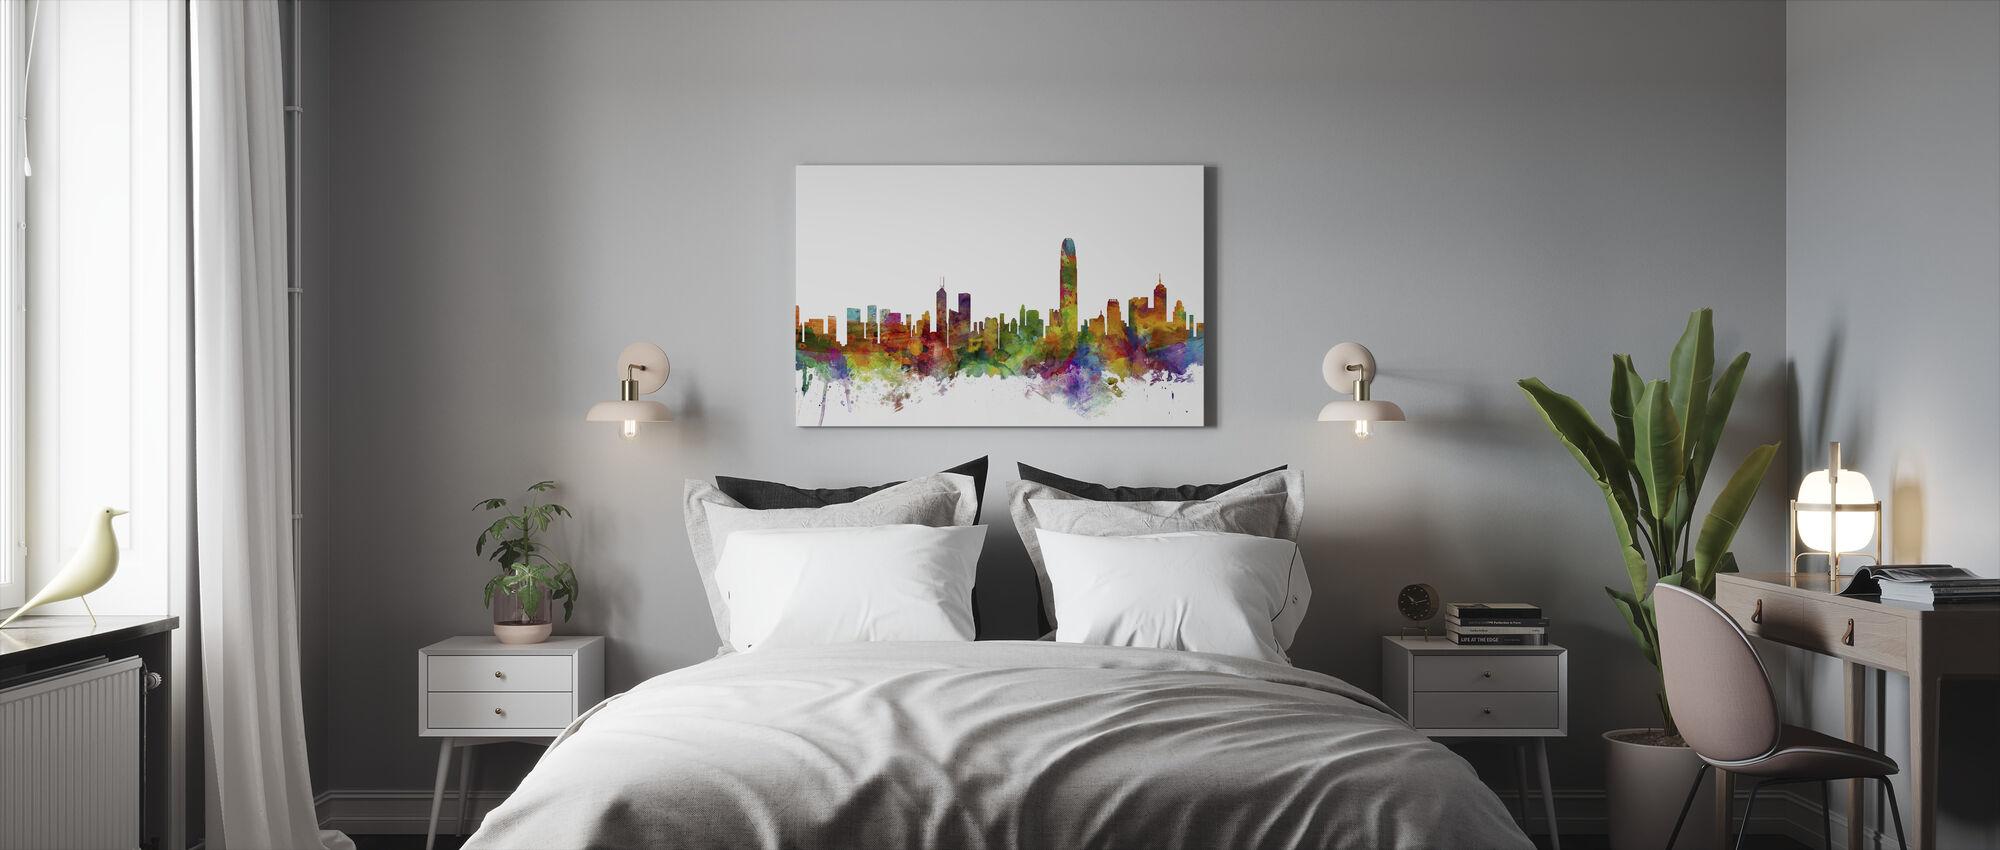 Hong Kong Skyline - Canvas print - Bedroom